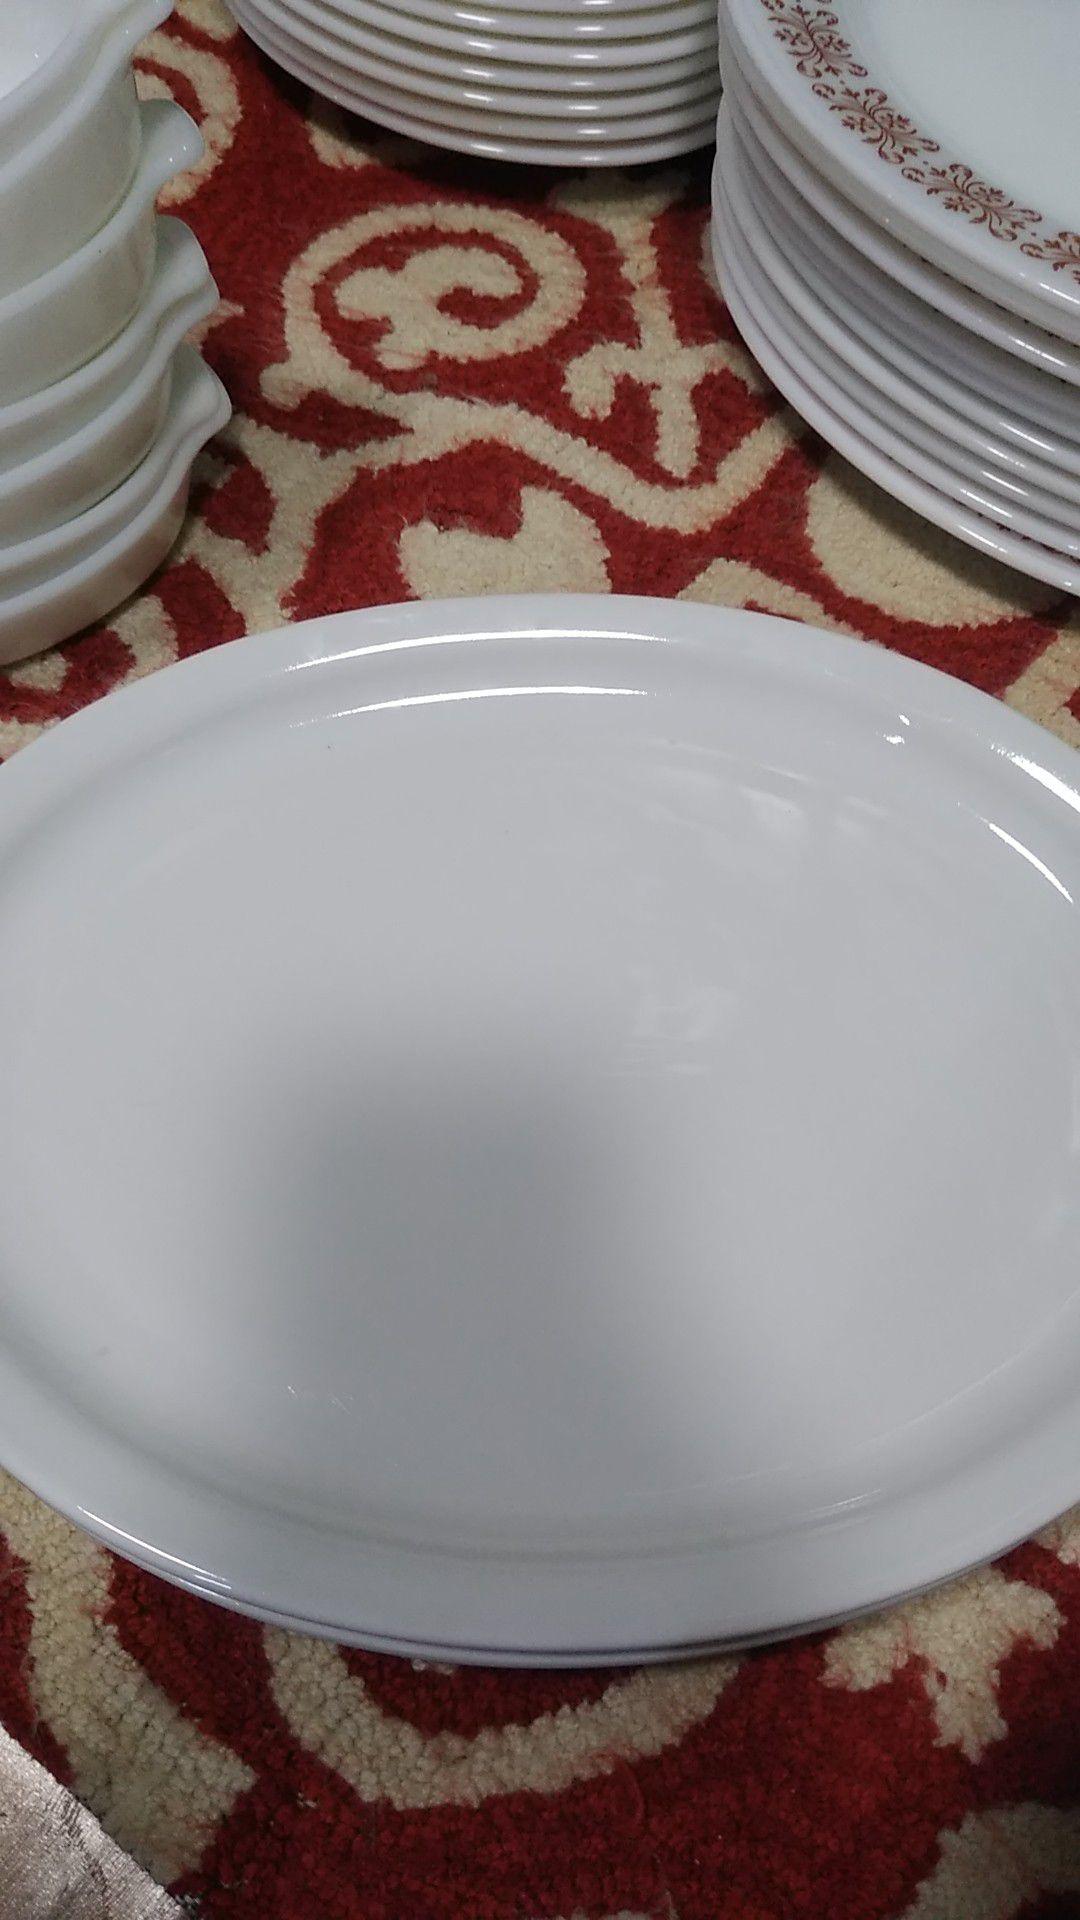 Inter American porcelain